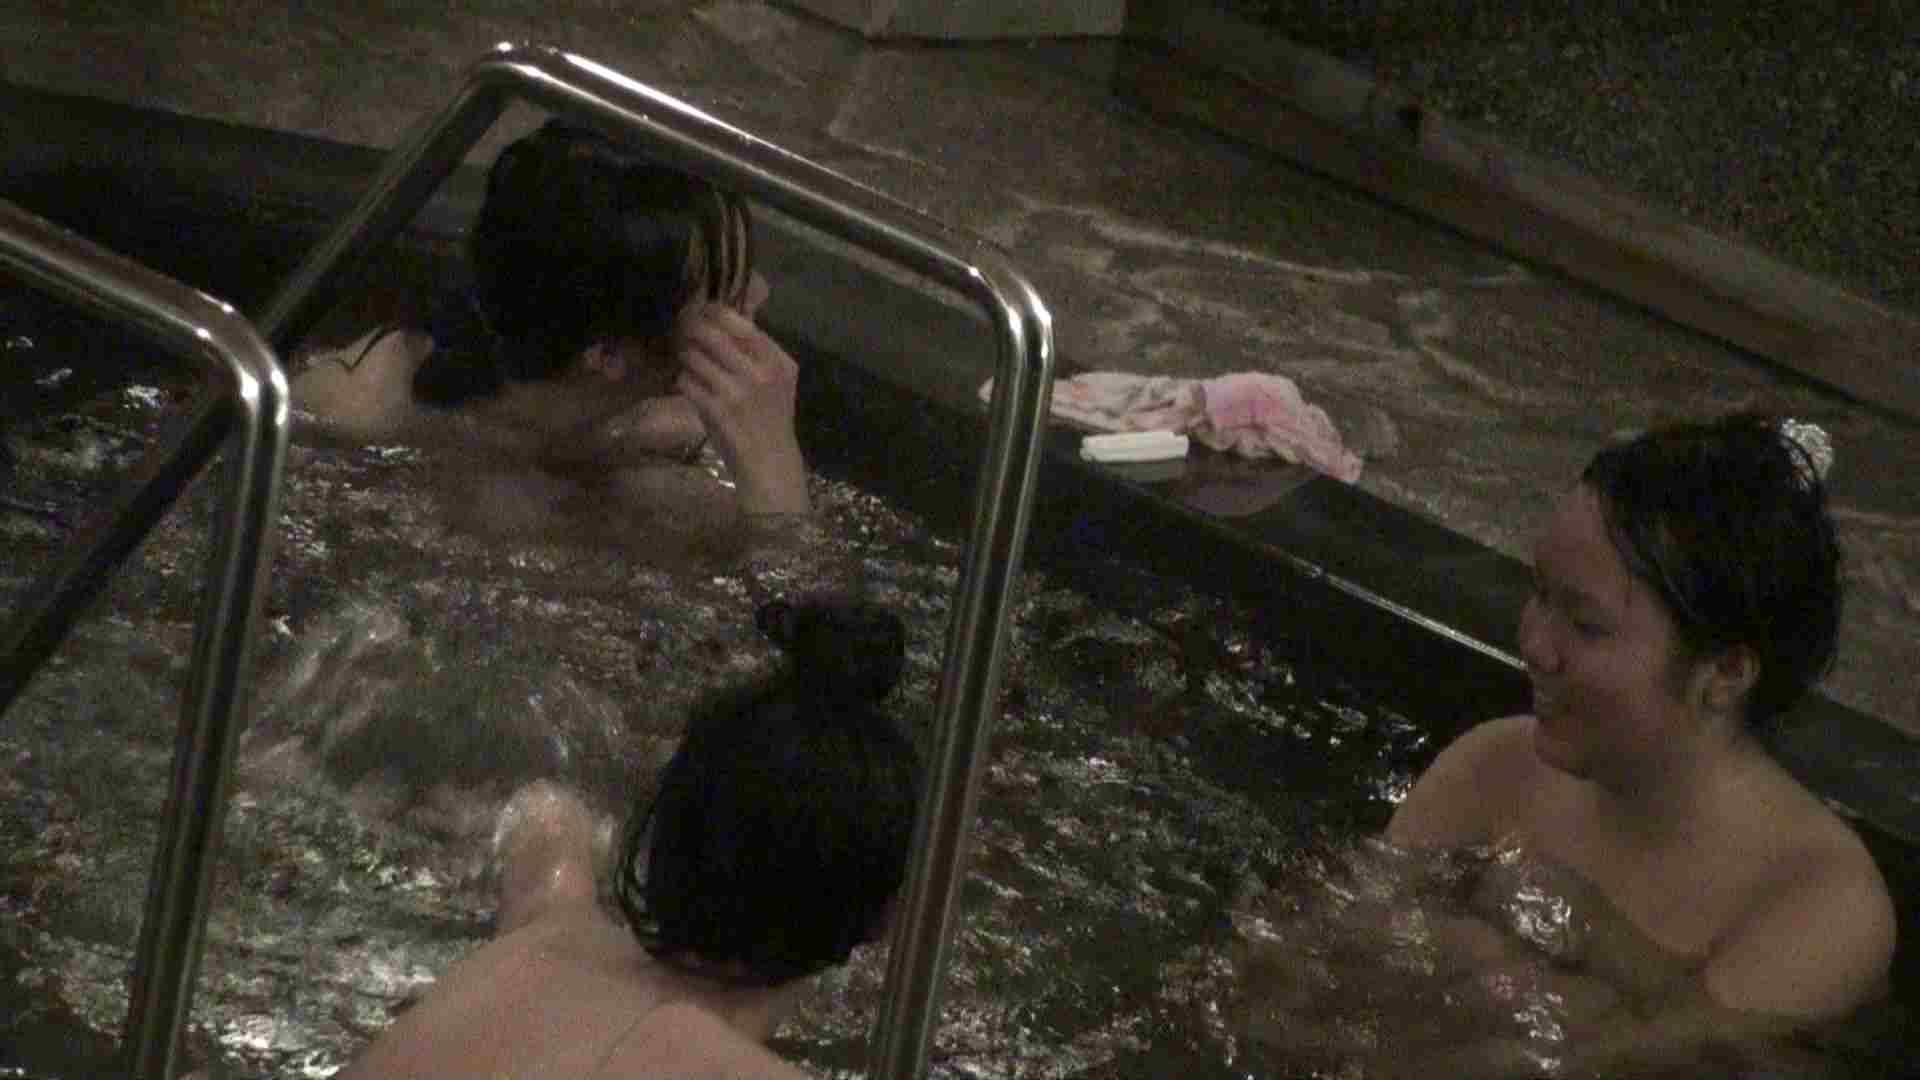 Aquaな露天風呂Vol.383 OLセックス 覗き性交動画流出 103画像 14